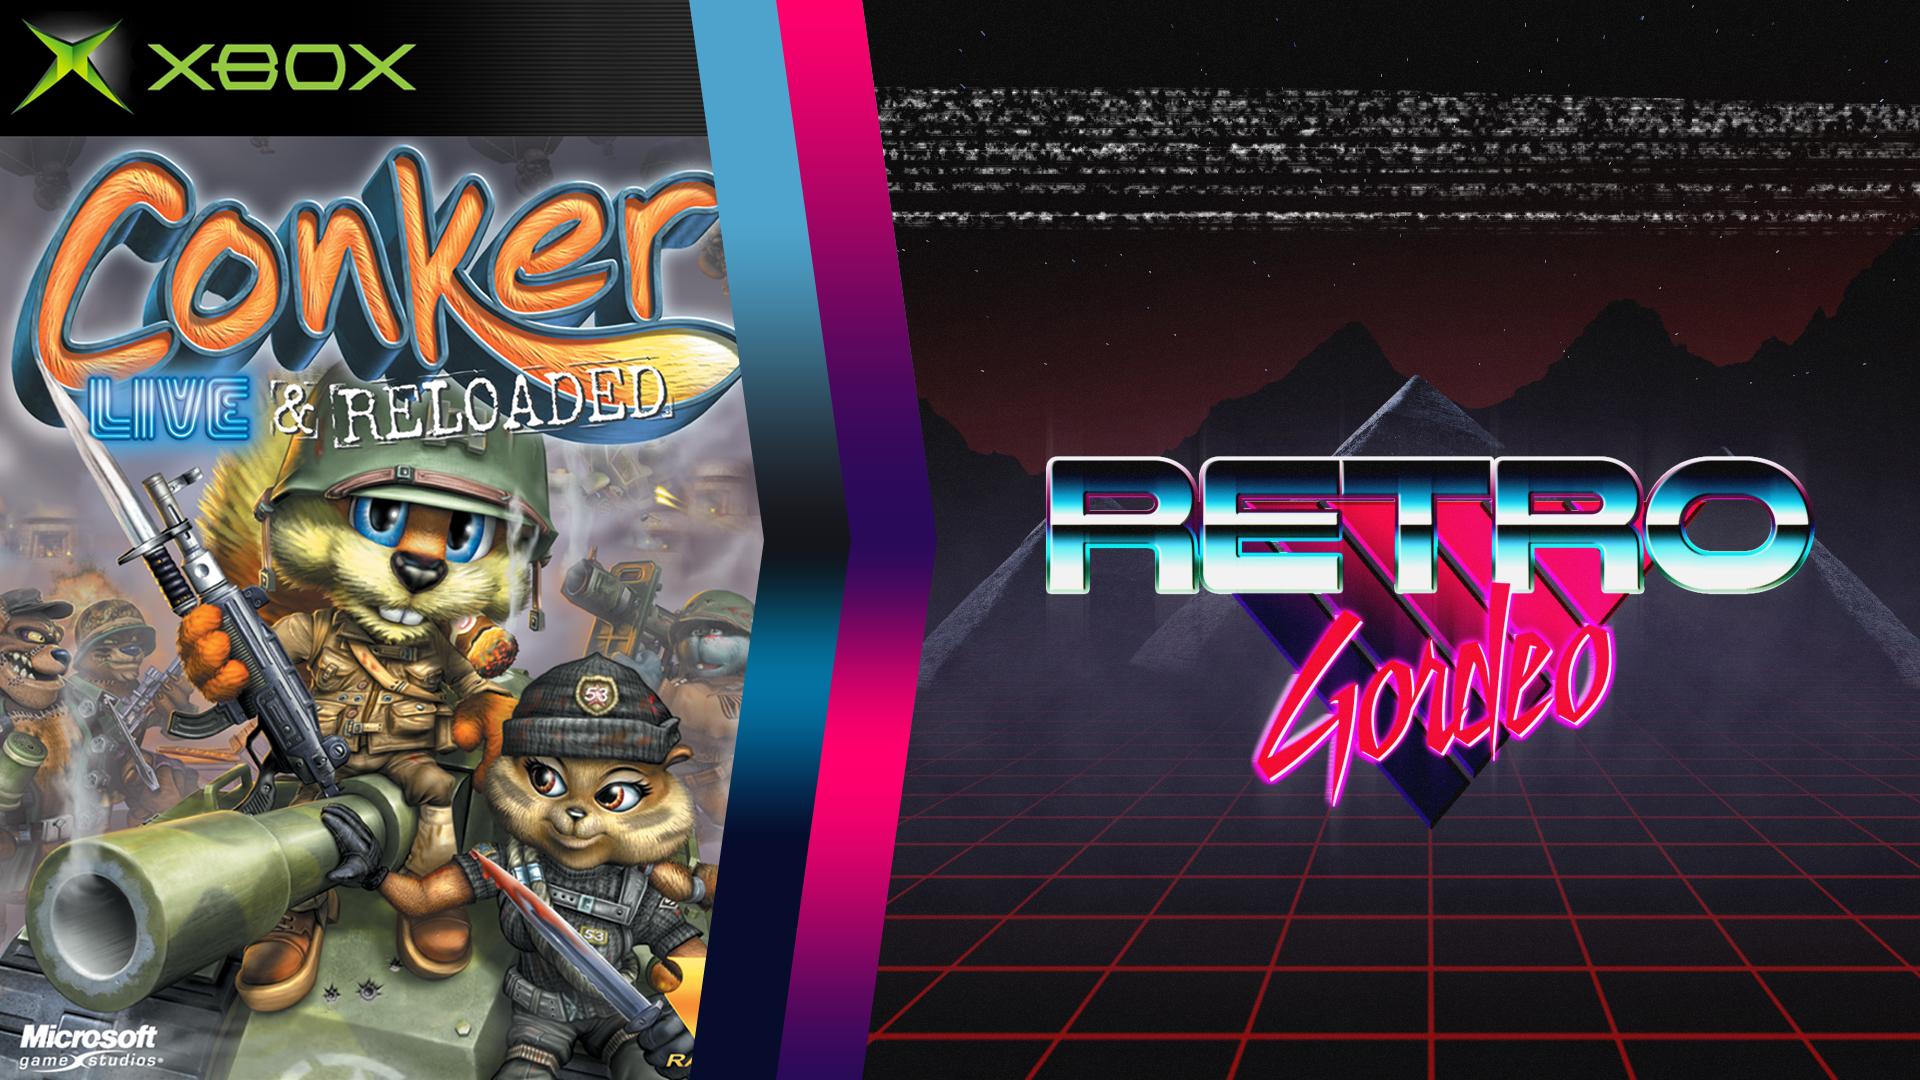 Retro Gordeo – Conker: Live & Reloaded